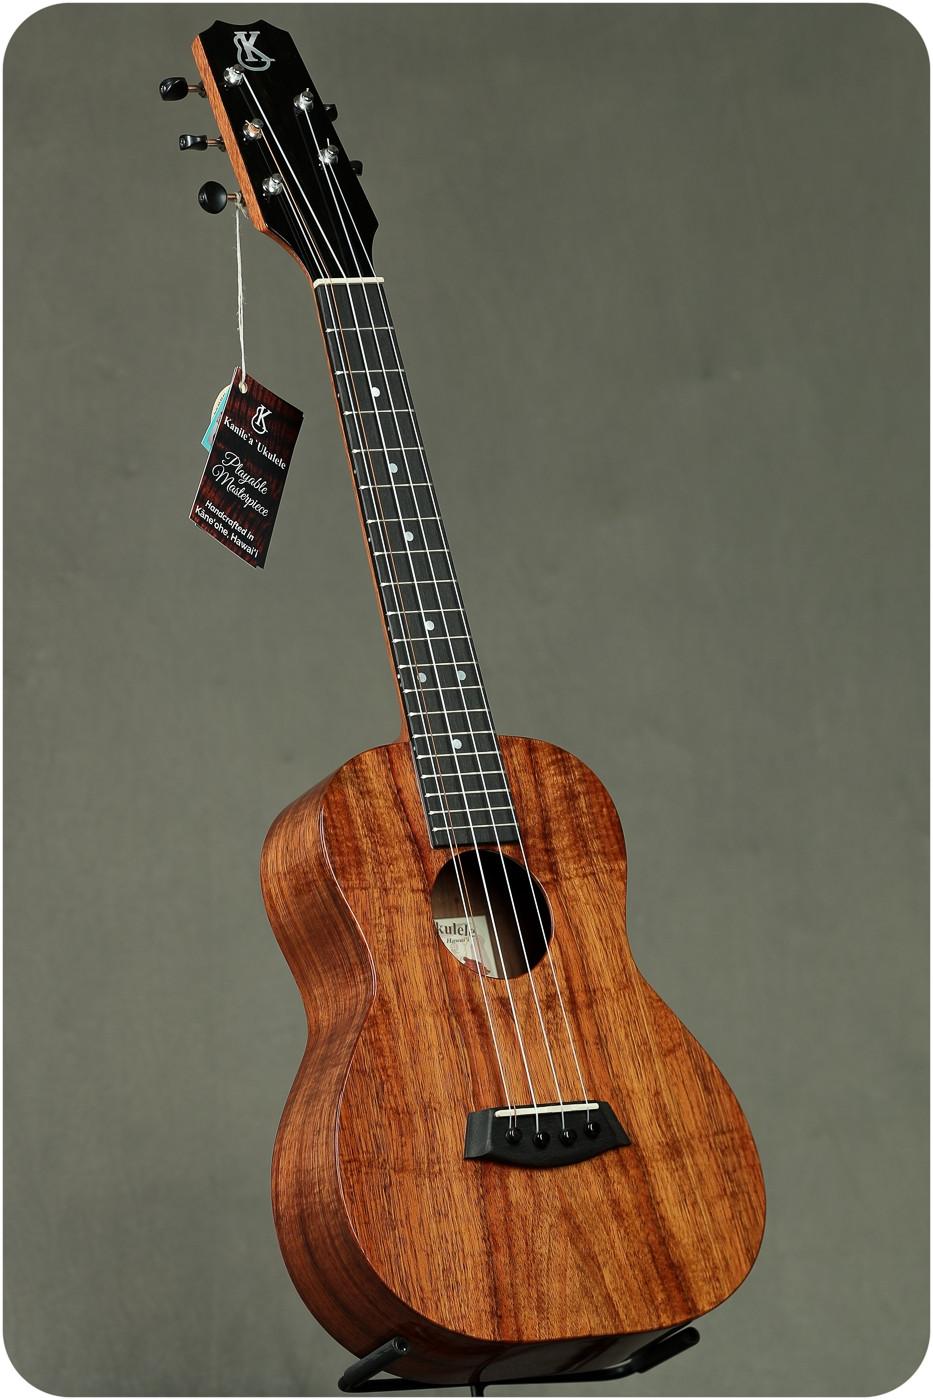 Kanile'a K-1 Koa Gloss Tenor 5 String (K-1 T5 Tru-R #21483)